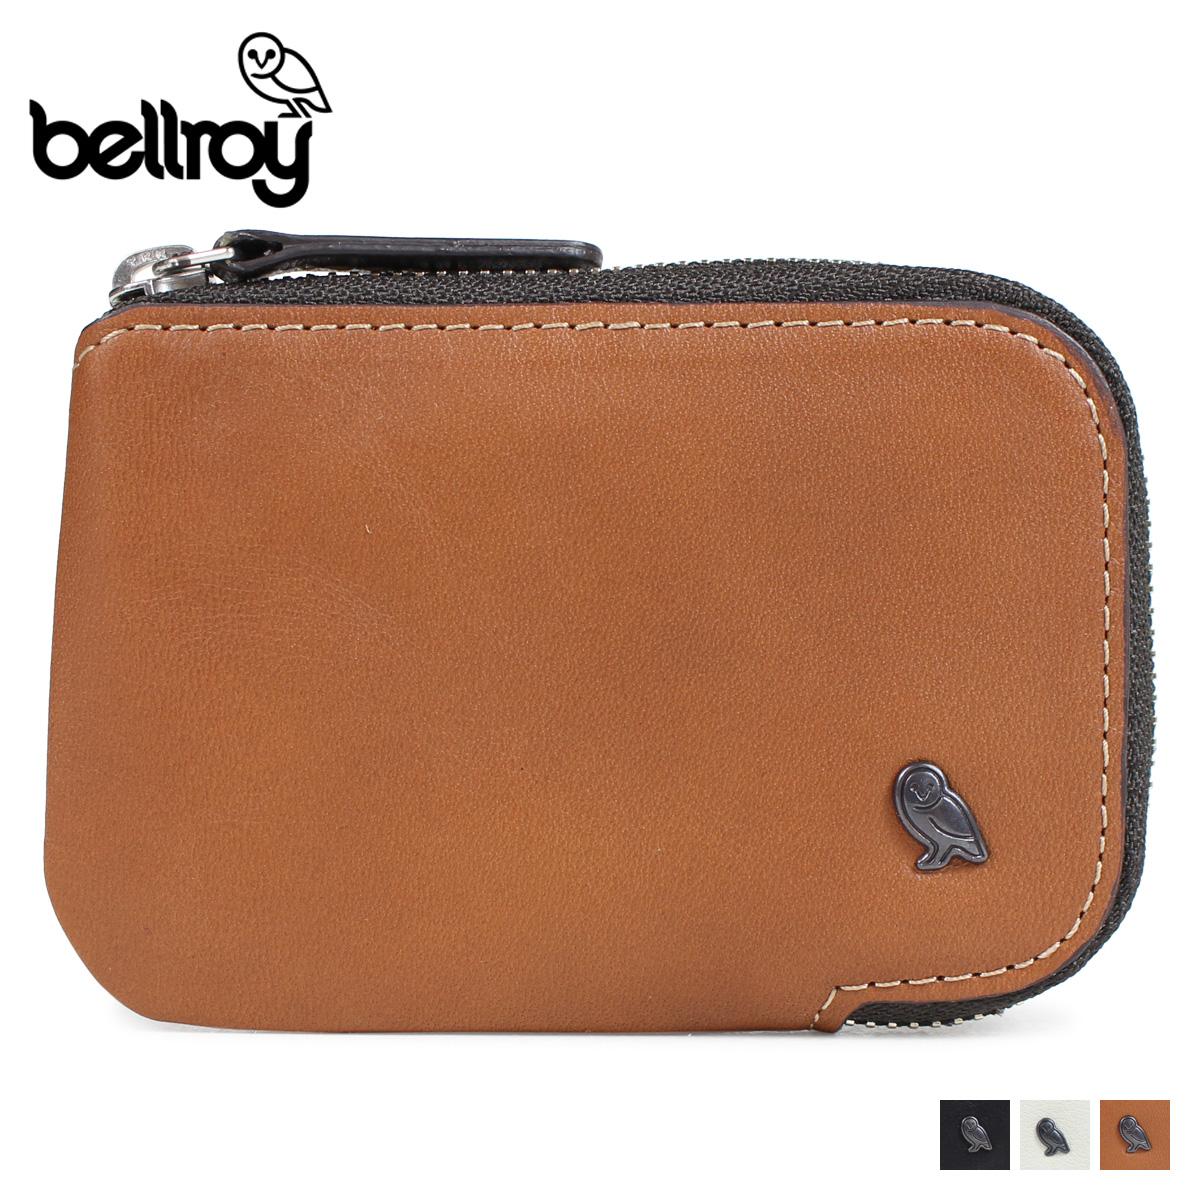 99f4bf7f5b6ec Bellroy CARD POCKET bell Roy wallet folio men gap Dis round fastener black  white brown black ...